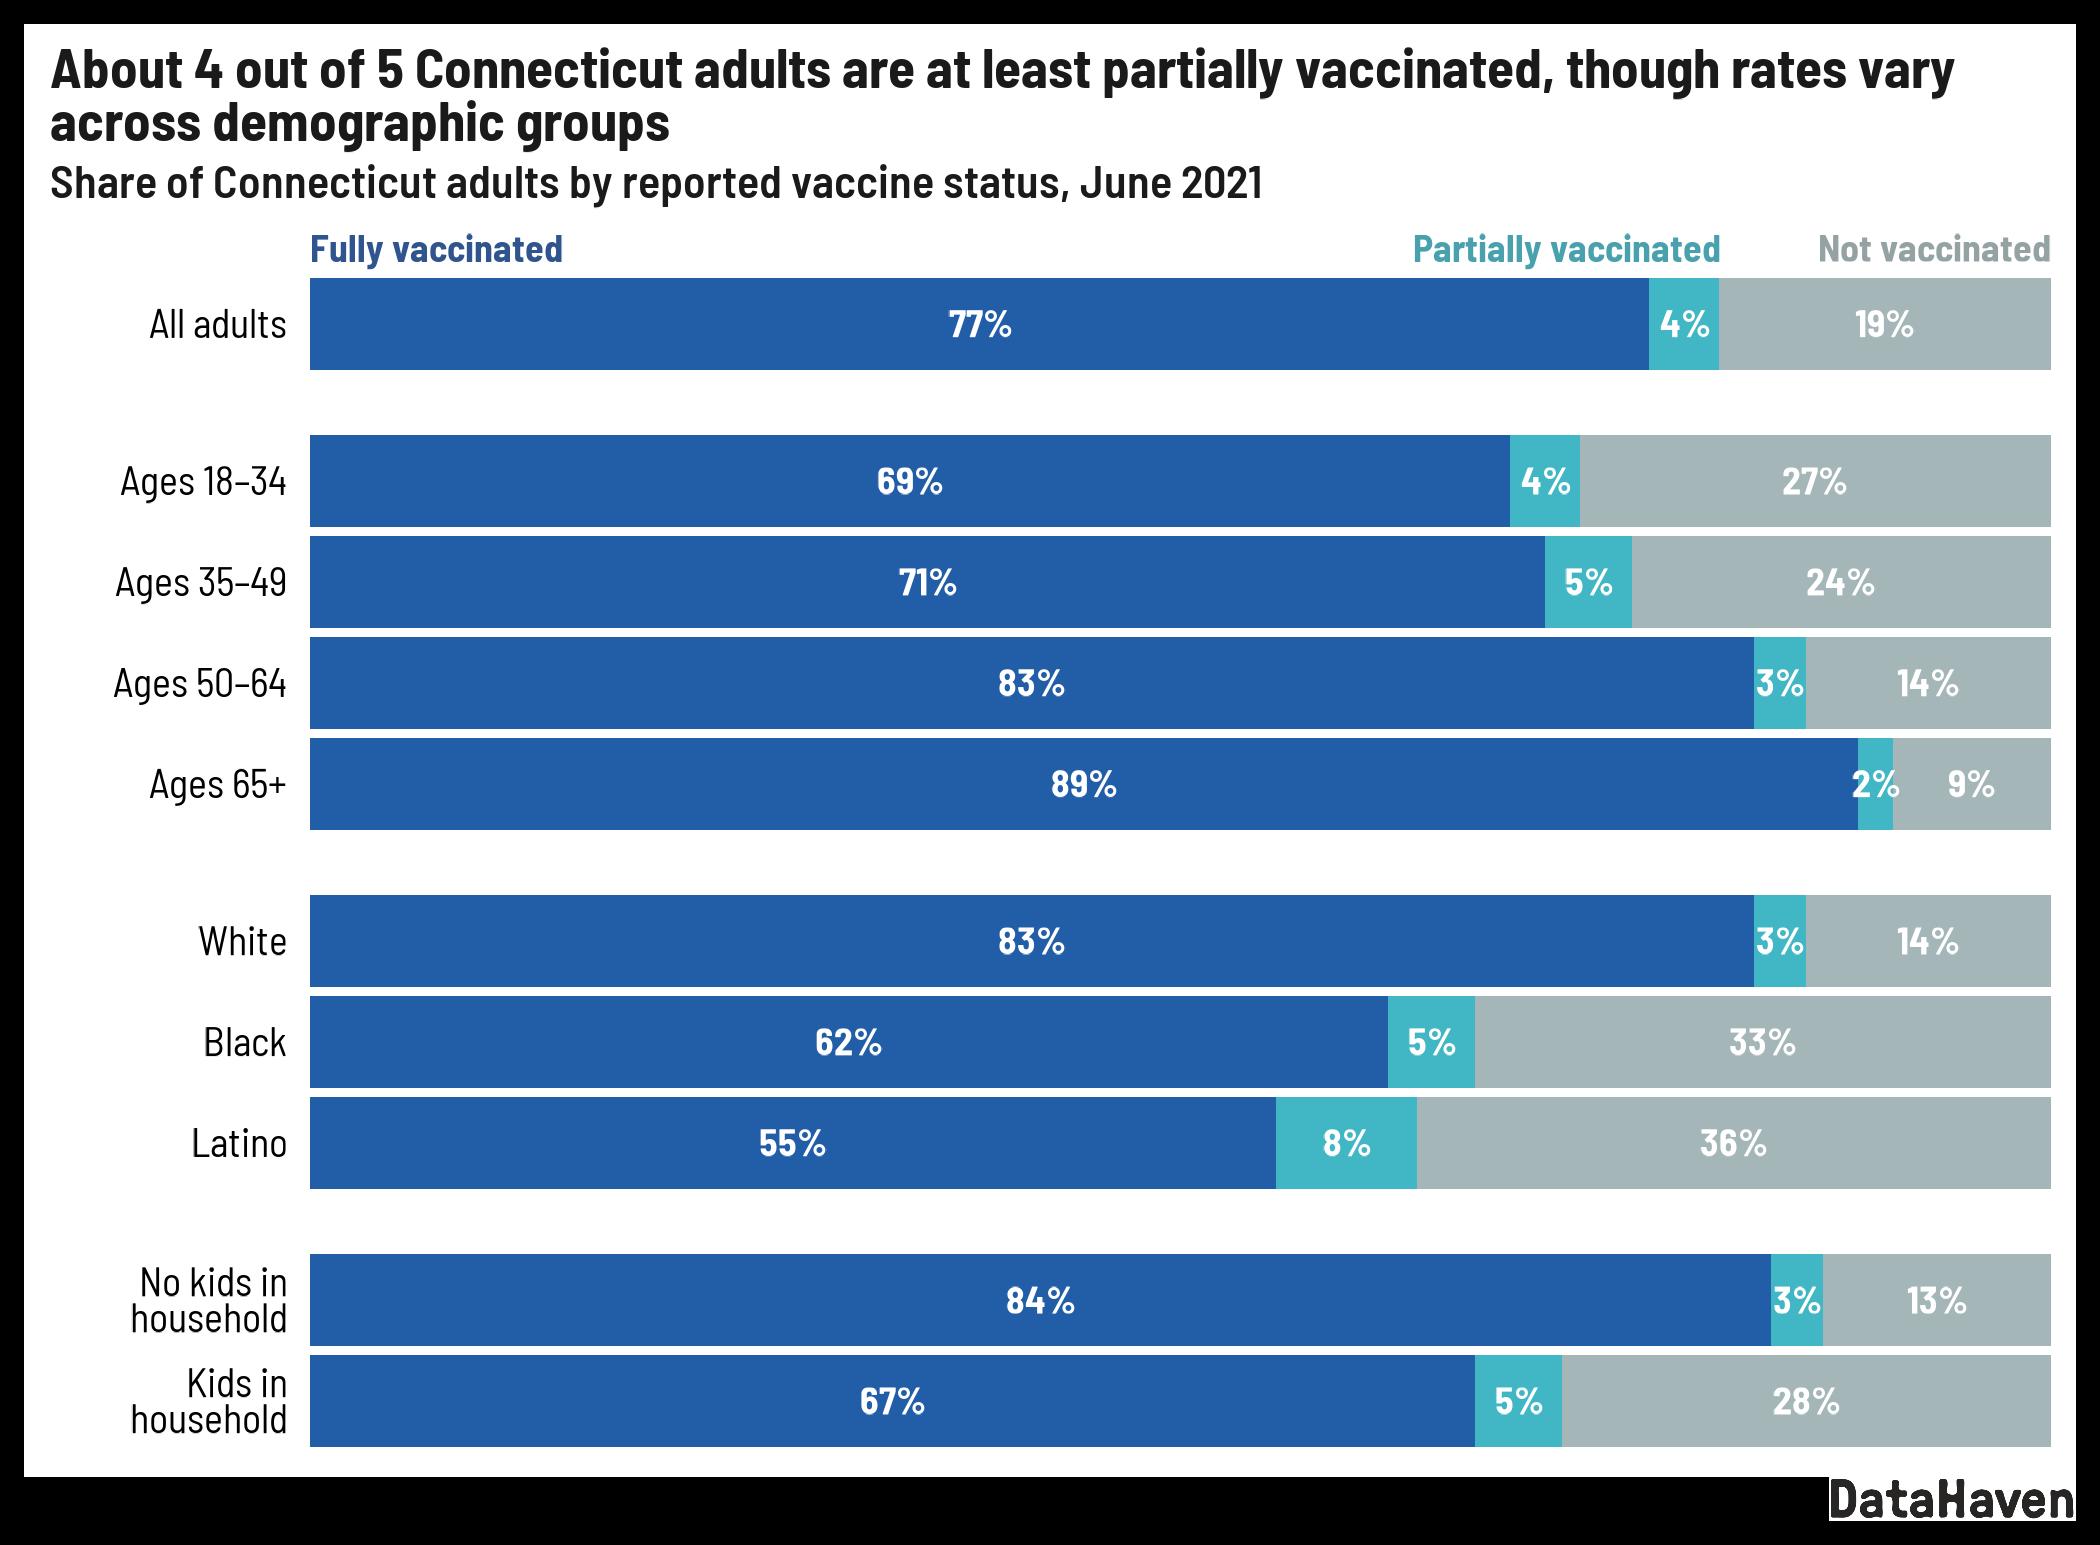 Connecticut data adult vaccine status as of June 2021 per DataHaven survey data